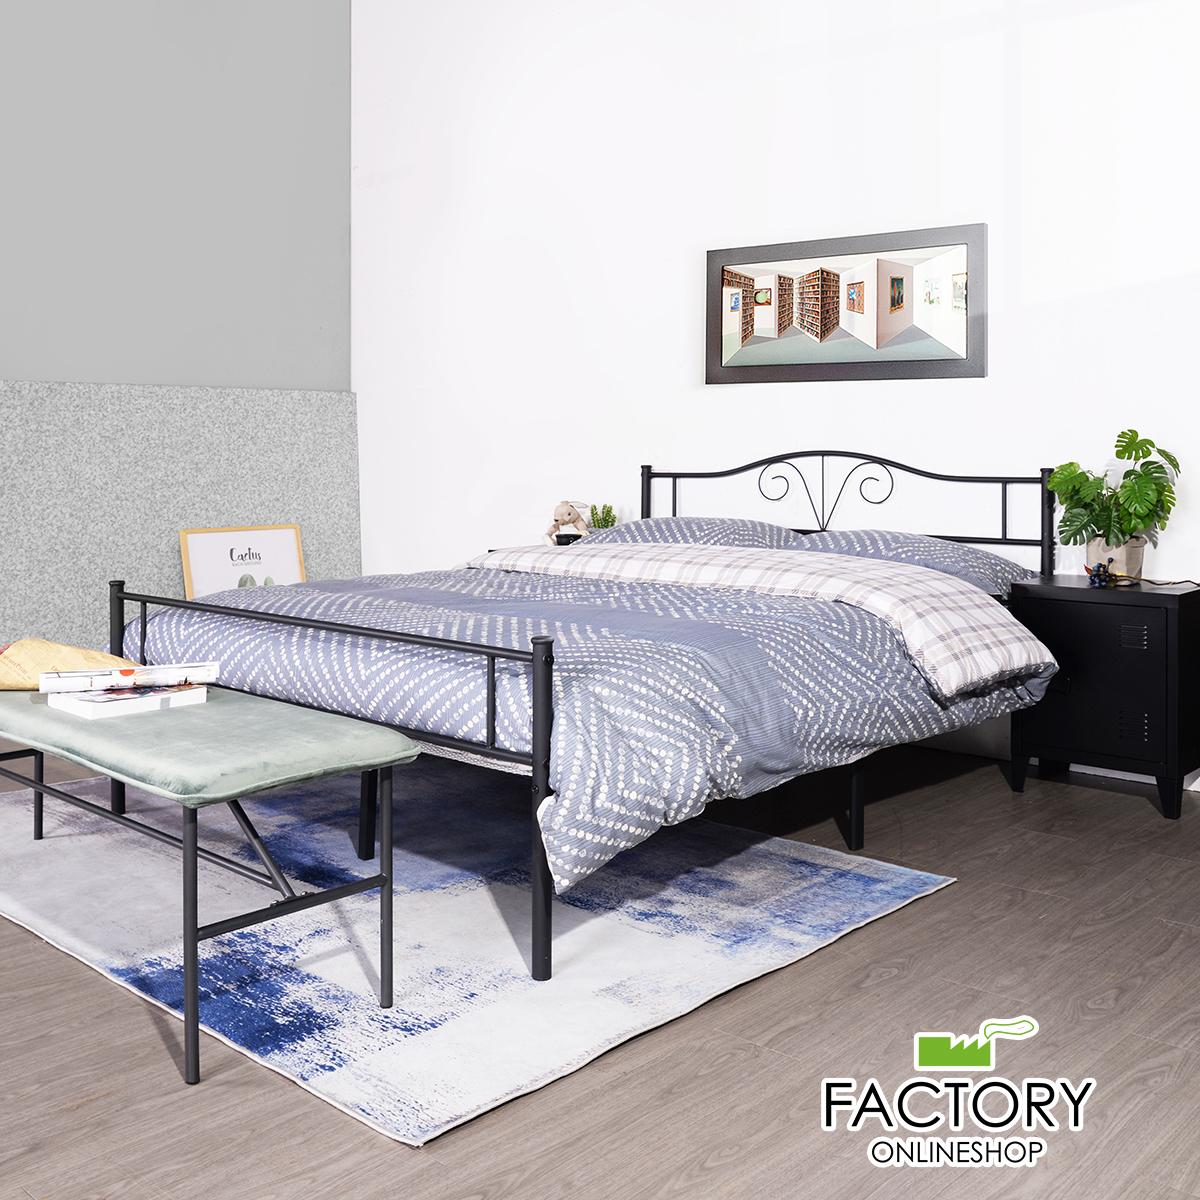 Image of: Geniqua Twin Full Queen Size Metal Bed Frame Platform Headboard Foundation Bedroom Walmart Com Walmart Com